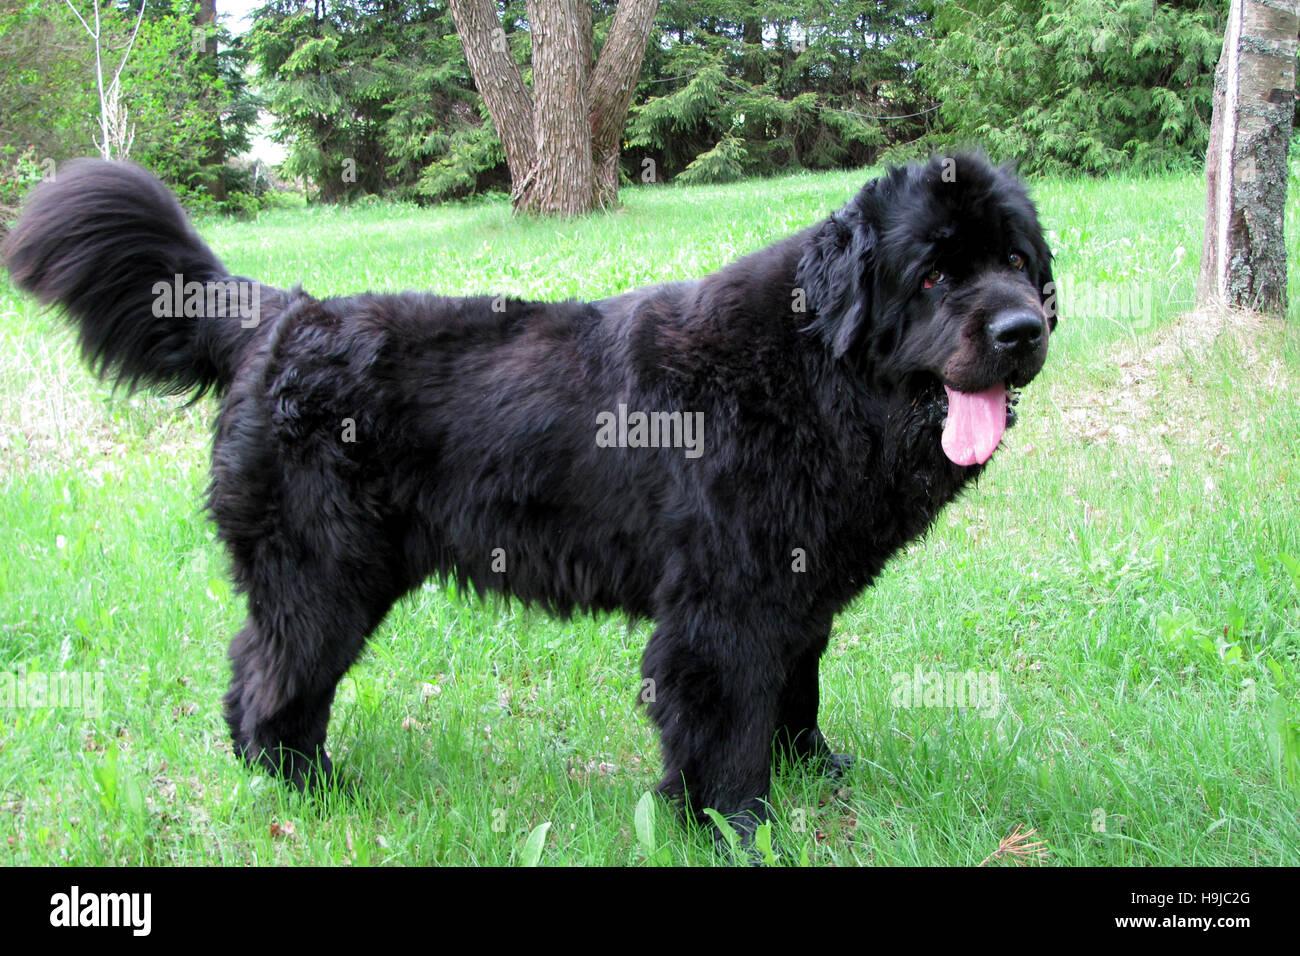 Newfoundland dog standing. - Stock Image